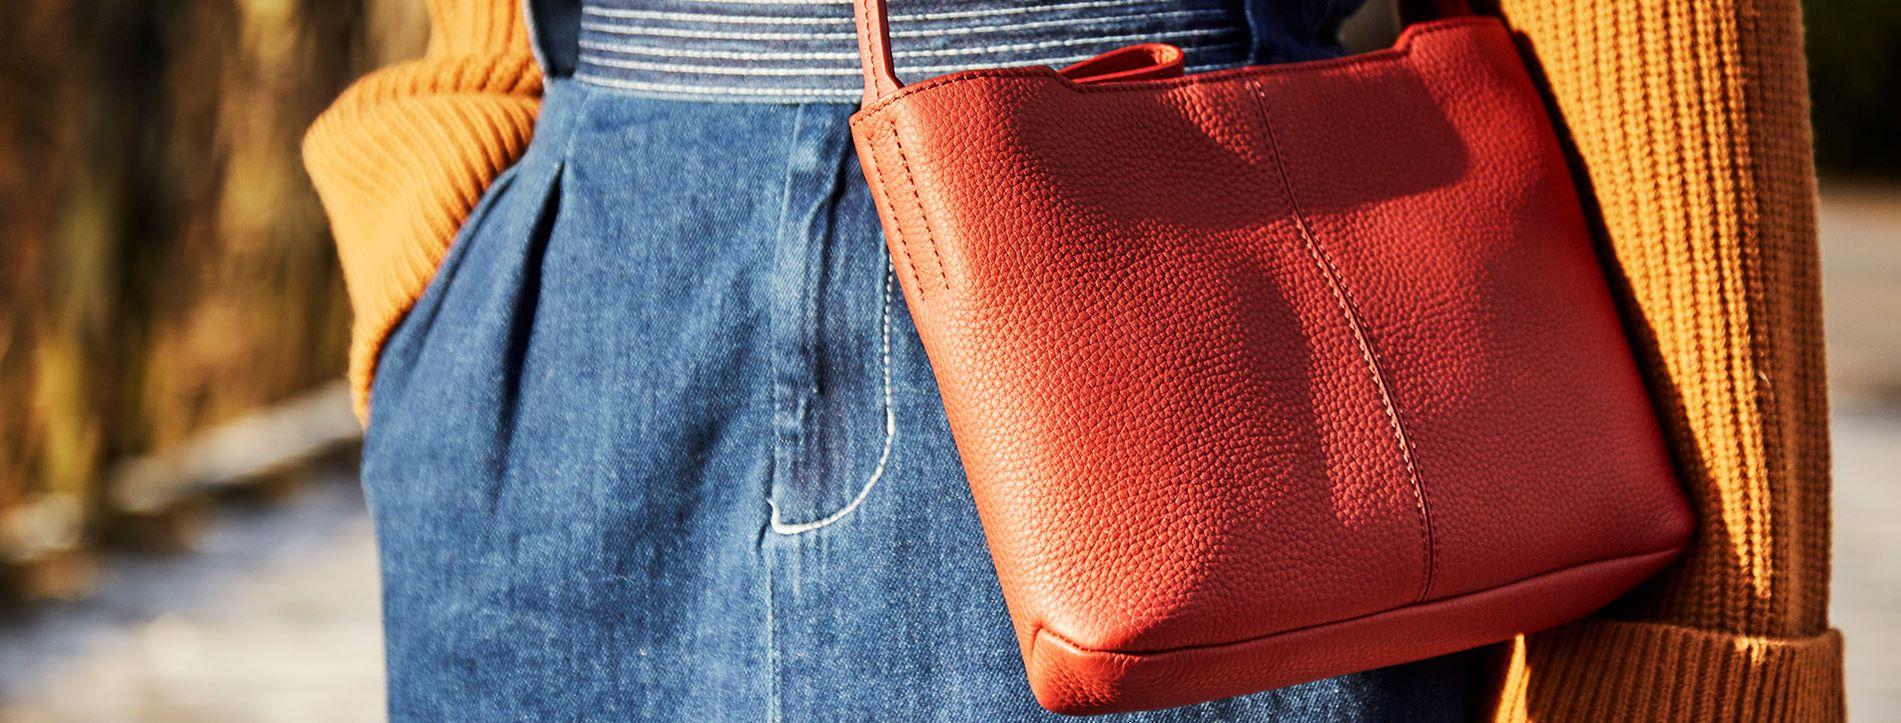 Ecco Is A Global Leader In Innovative Comfort Footwear For Men Nan Ph Pro 3 800g Elegant Clean Design